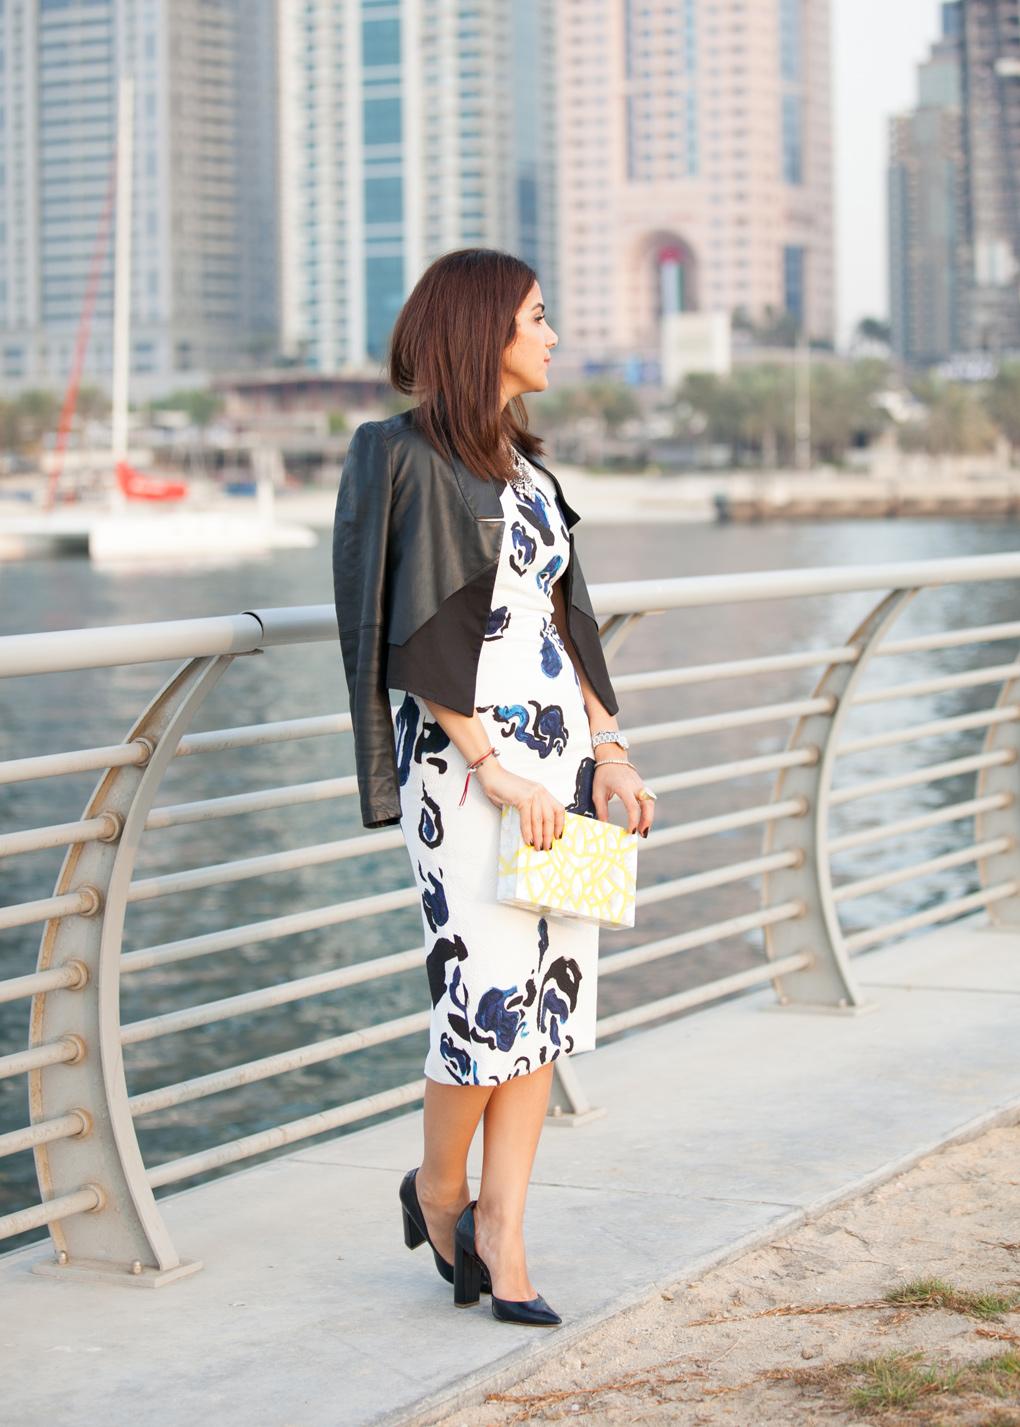 Lyla_Loves_Fashion_Michael_van_der_ham_dress_Nathalie_Trad-(22-of-55)